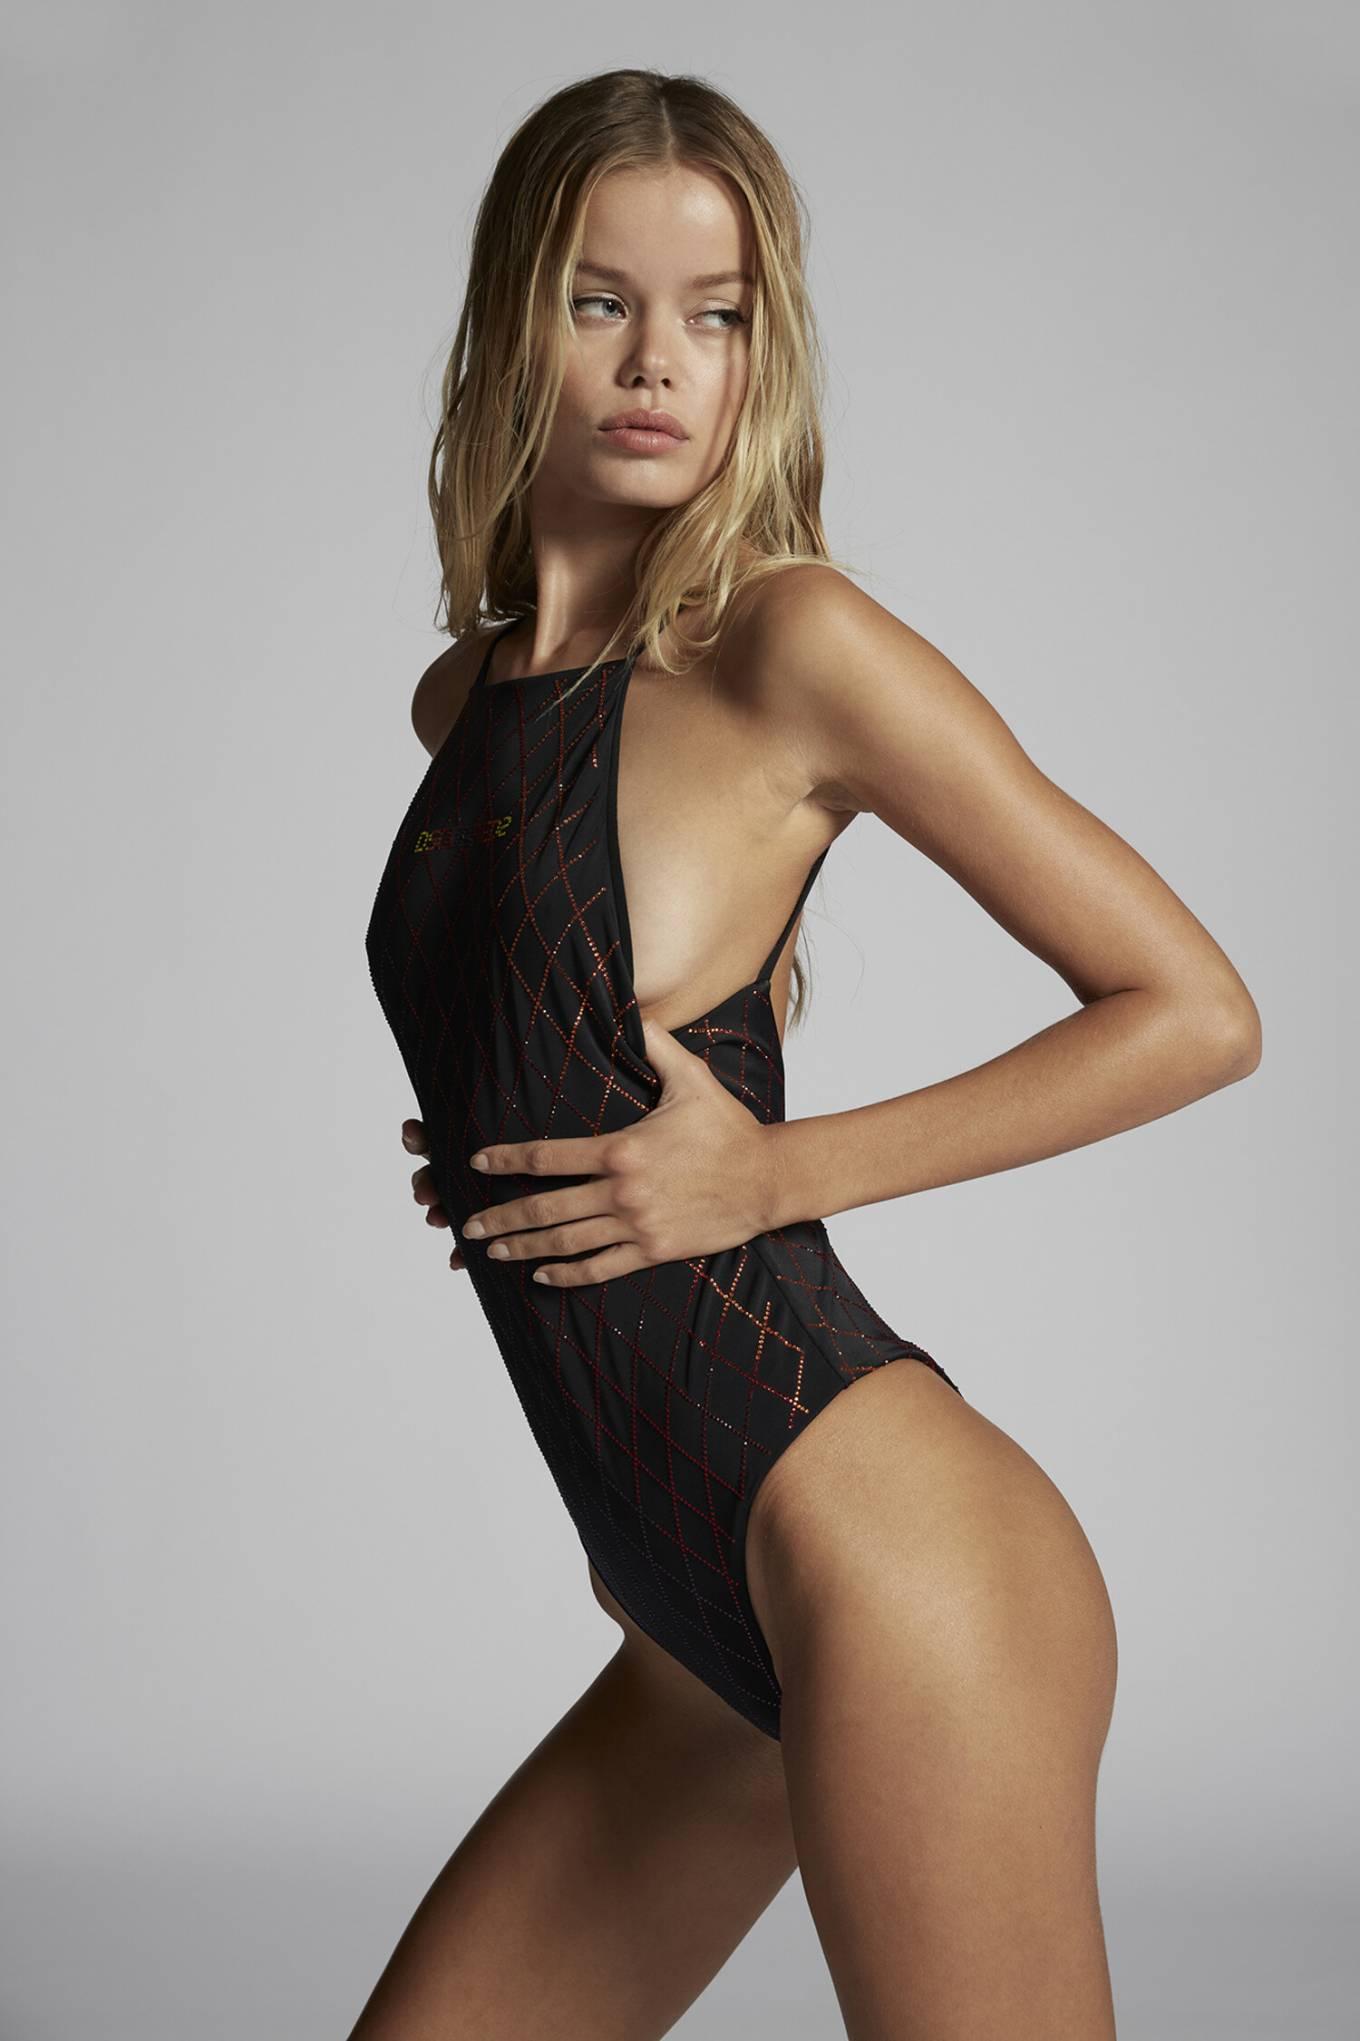 Frida Aasen donning a skimpy bodysuit with Polyamide, Rhinestones and spaghetti straps